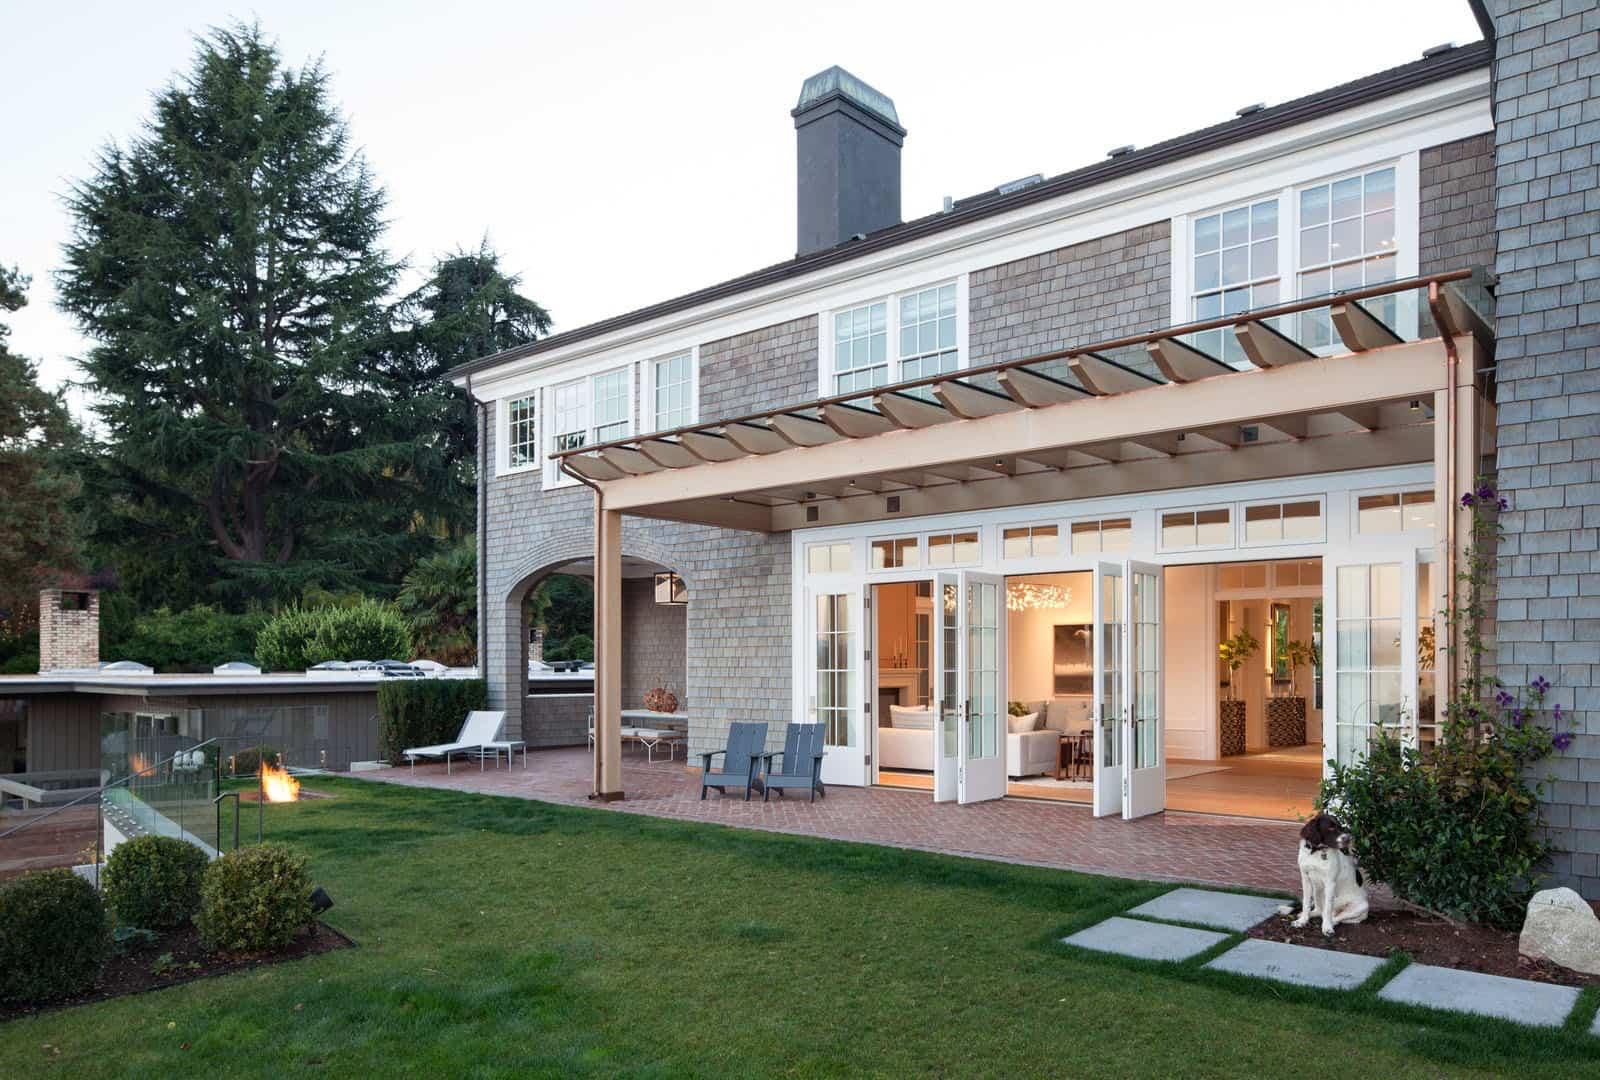 georgian-style-home-exterior-patio